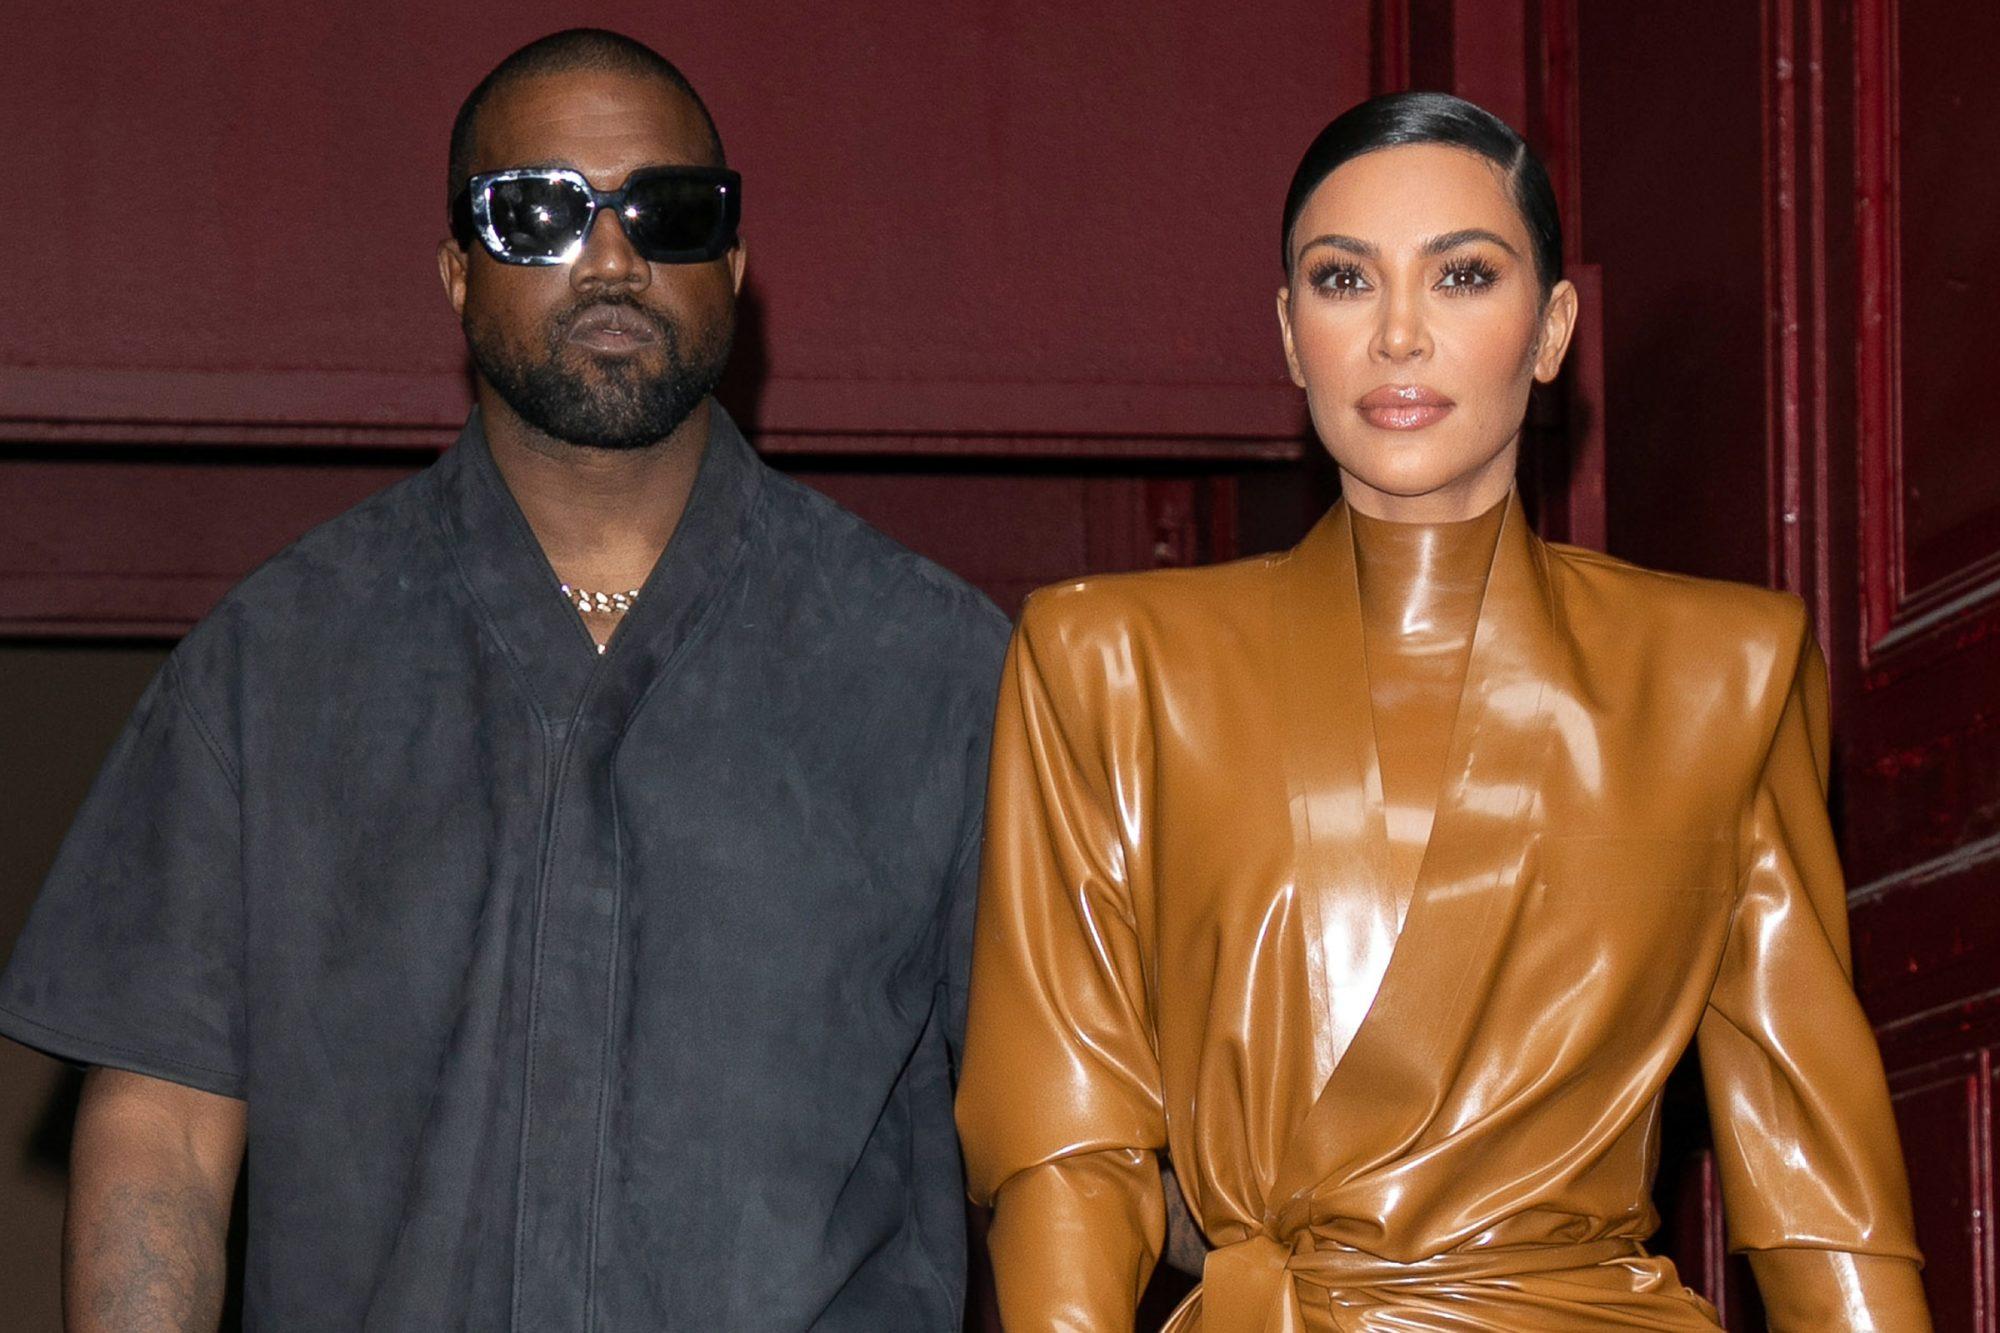 kuwtk-kim-kardashian-reportedly-weighing-all-options-amid-kanye-wests-explosive-rants